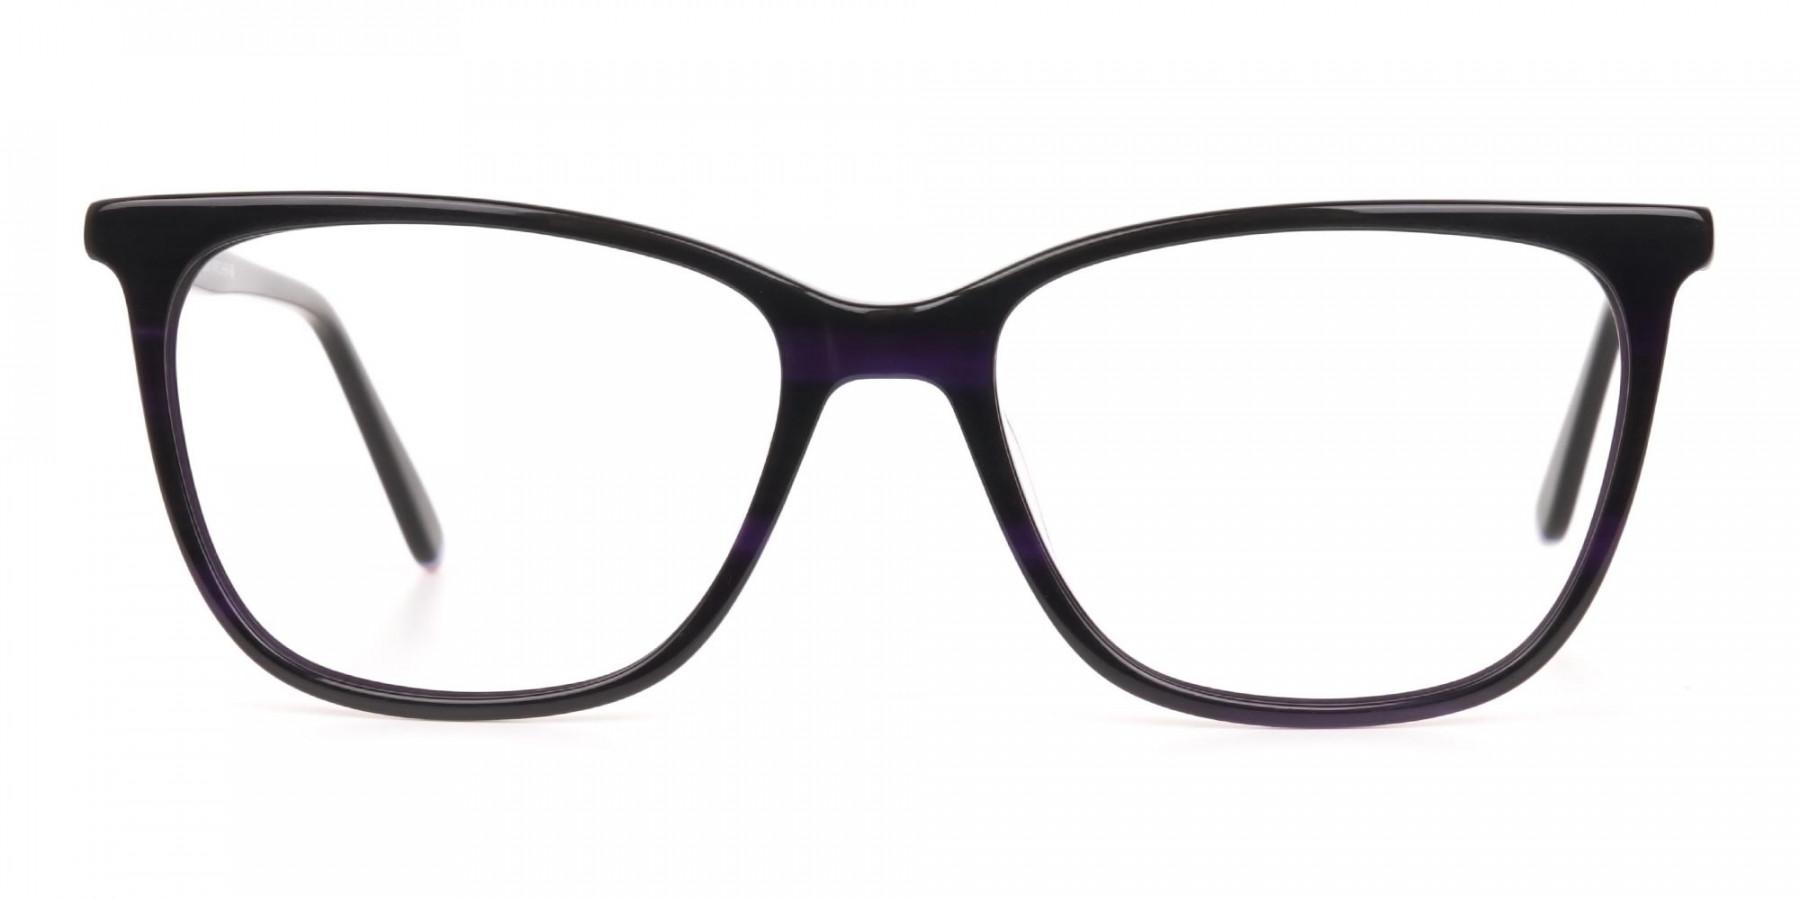 Designer Dark Violet Marble Eyeglasses Unisex-1